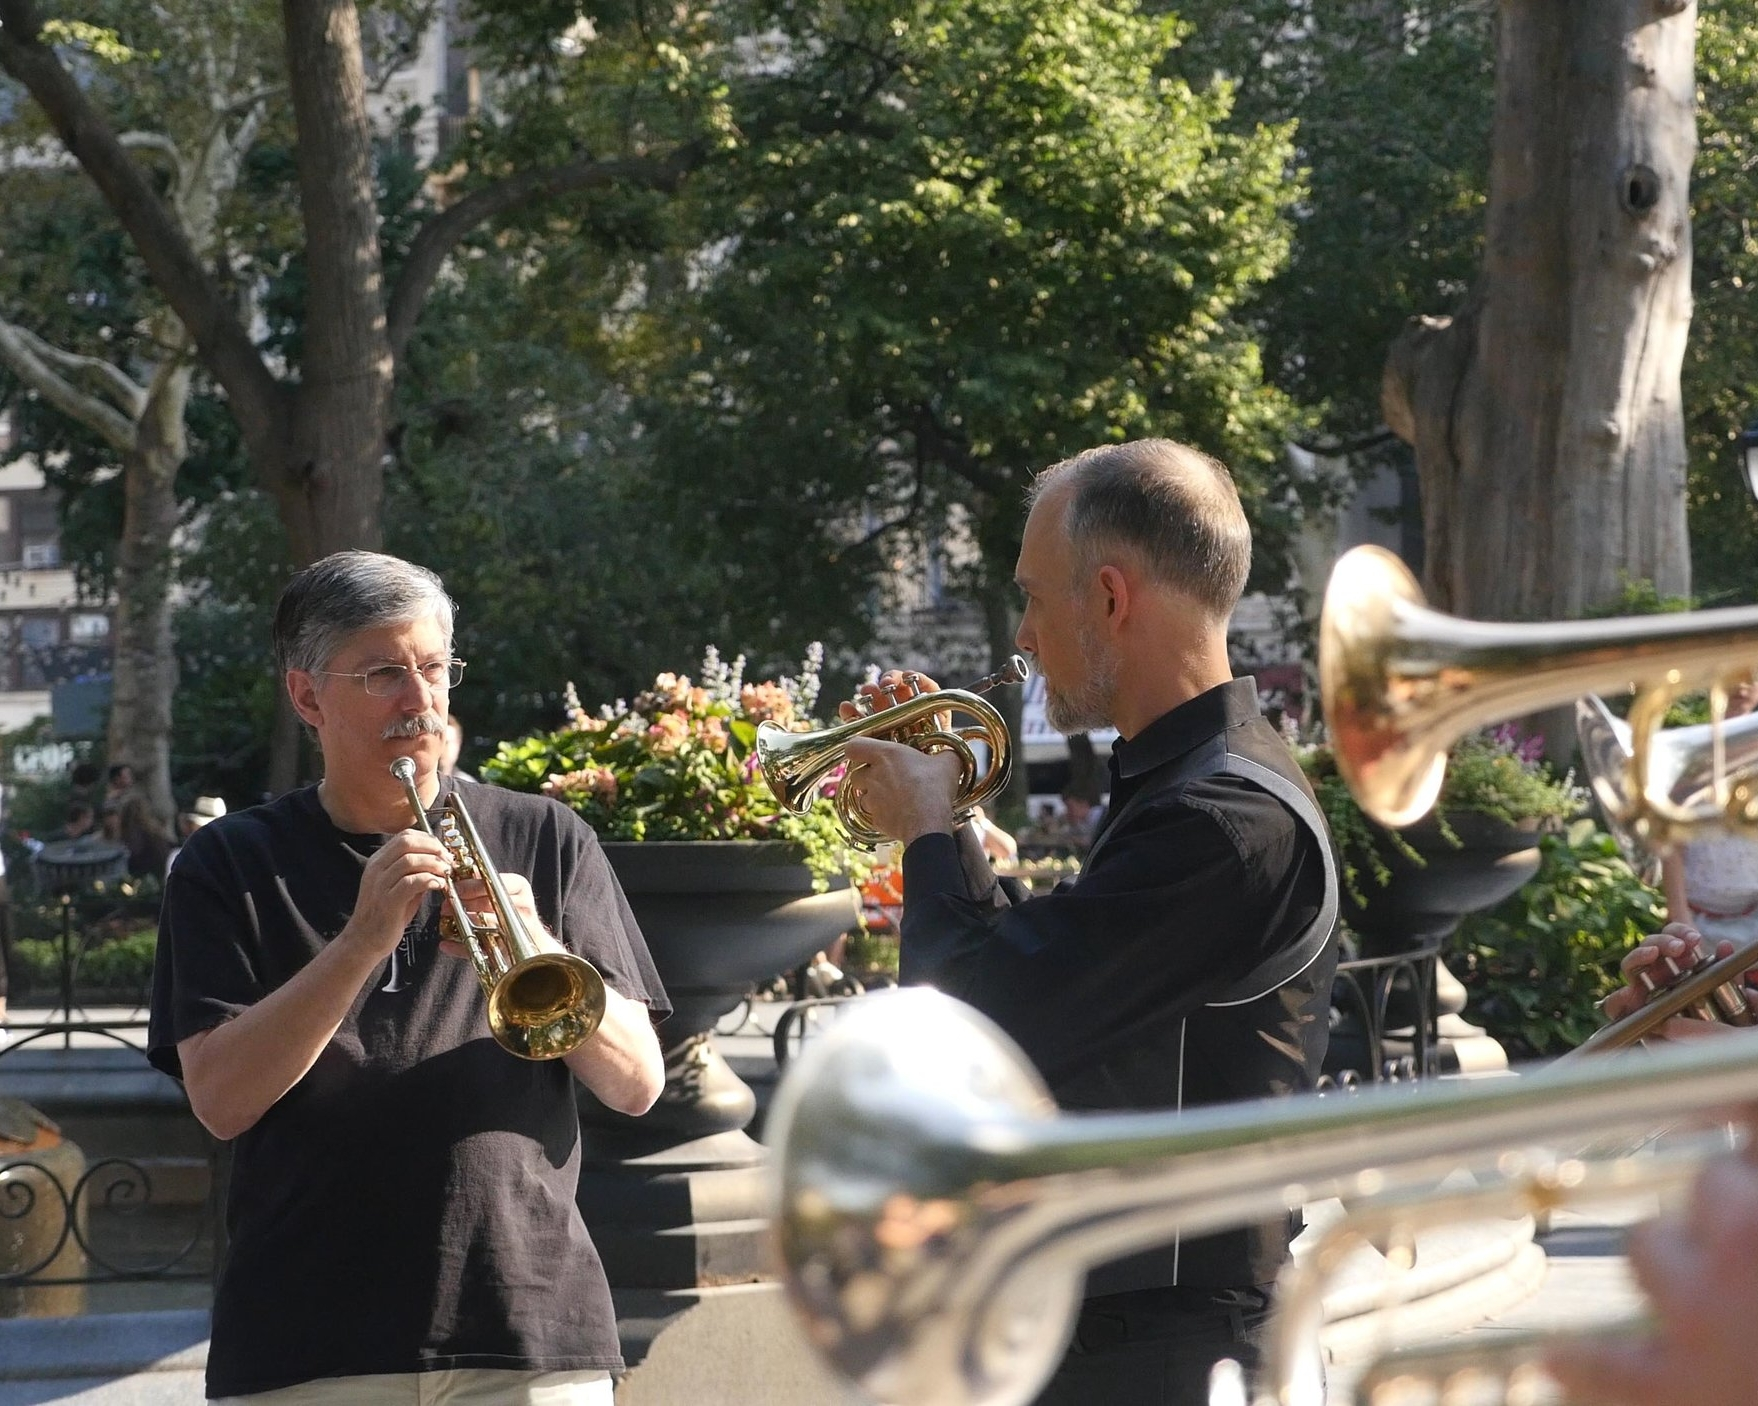 TrumpetClouds.5.Adele_Fournet.jpg